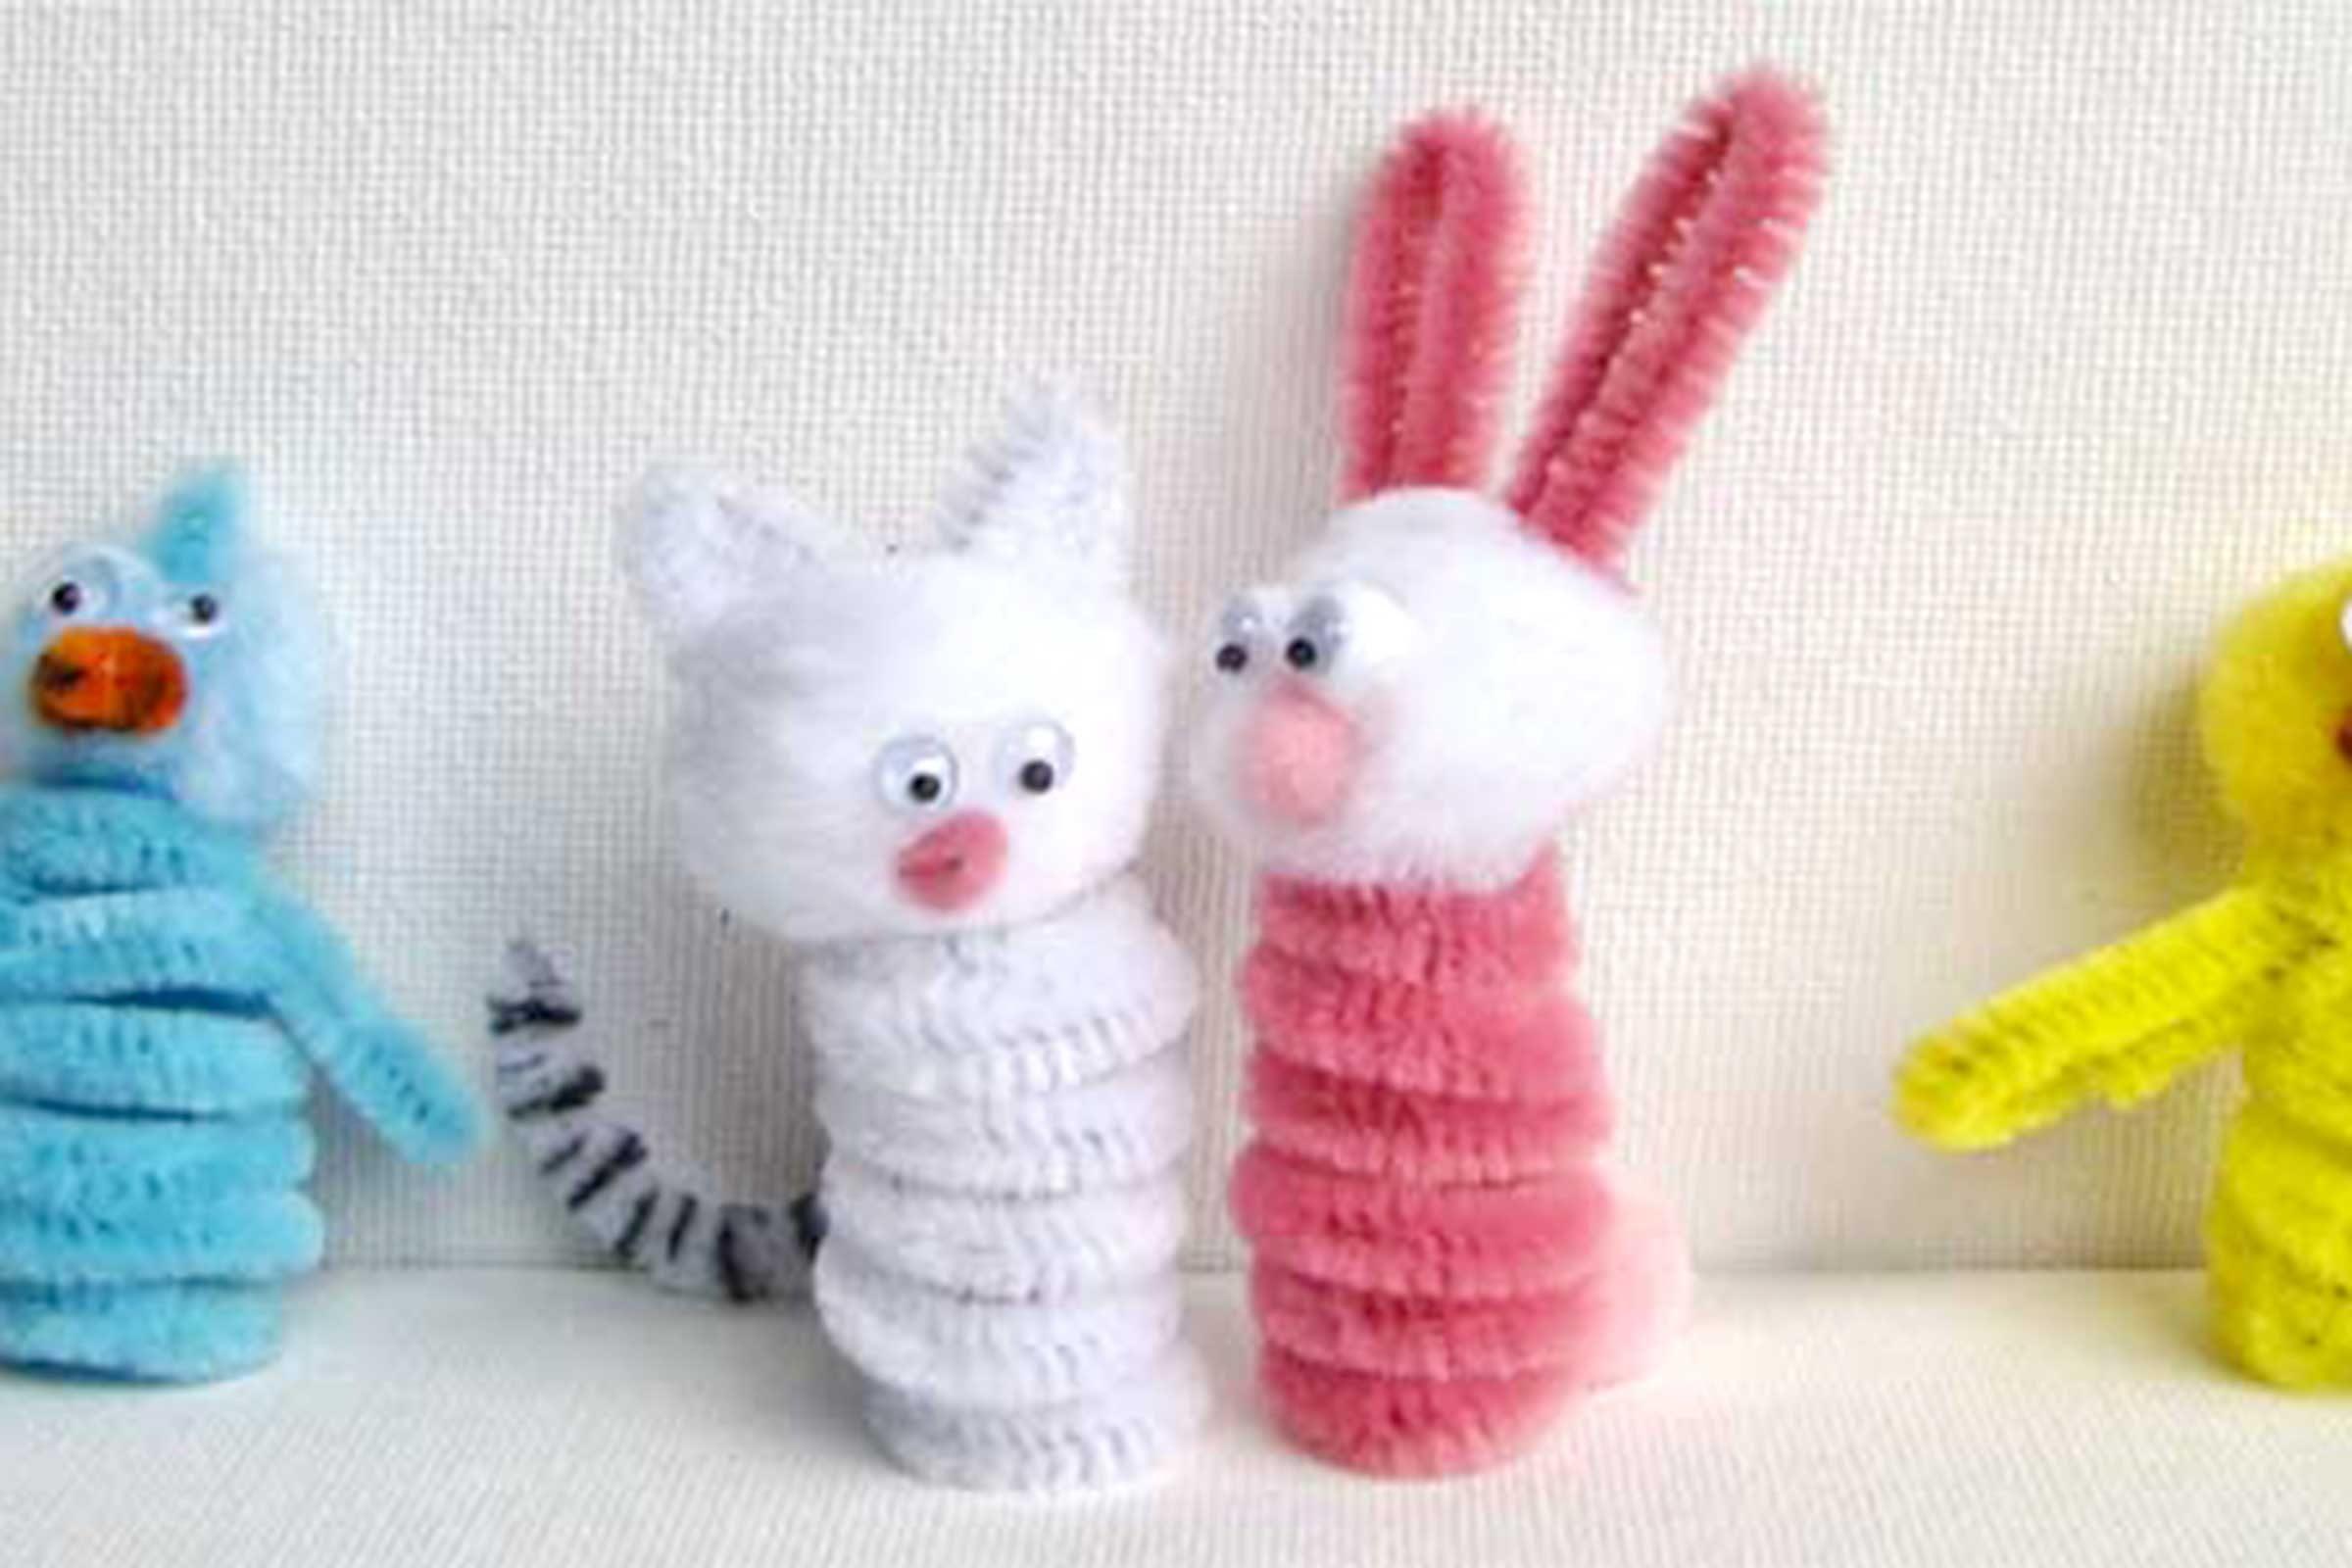 easter crafts to brighten